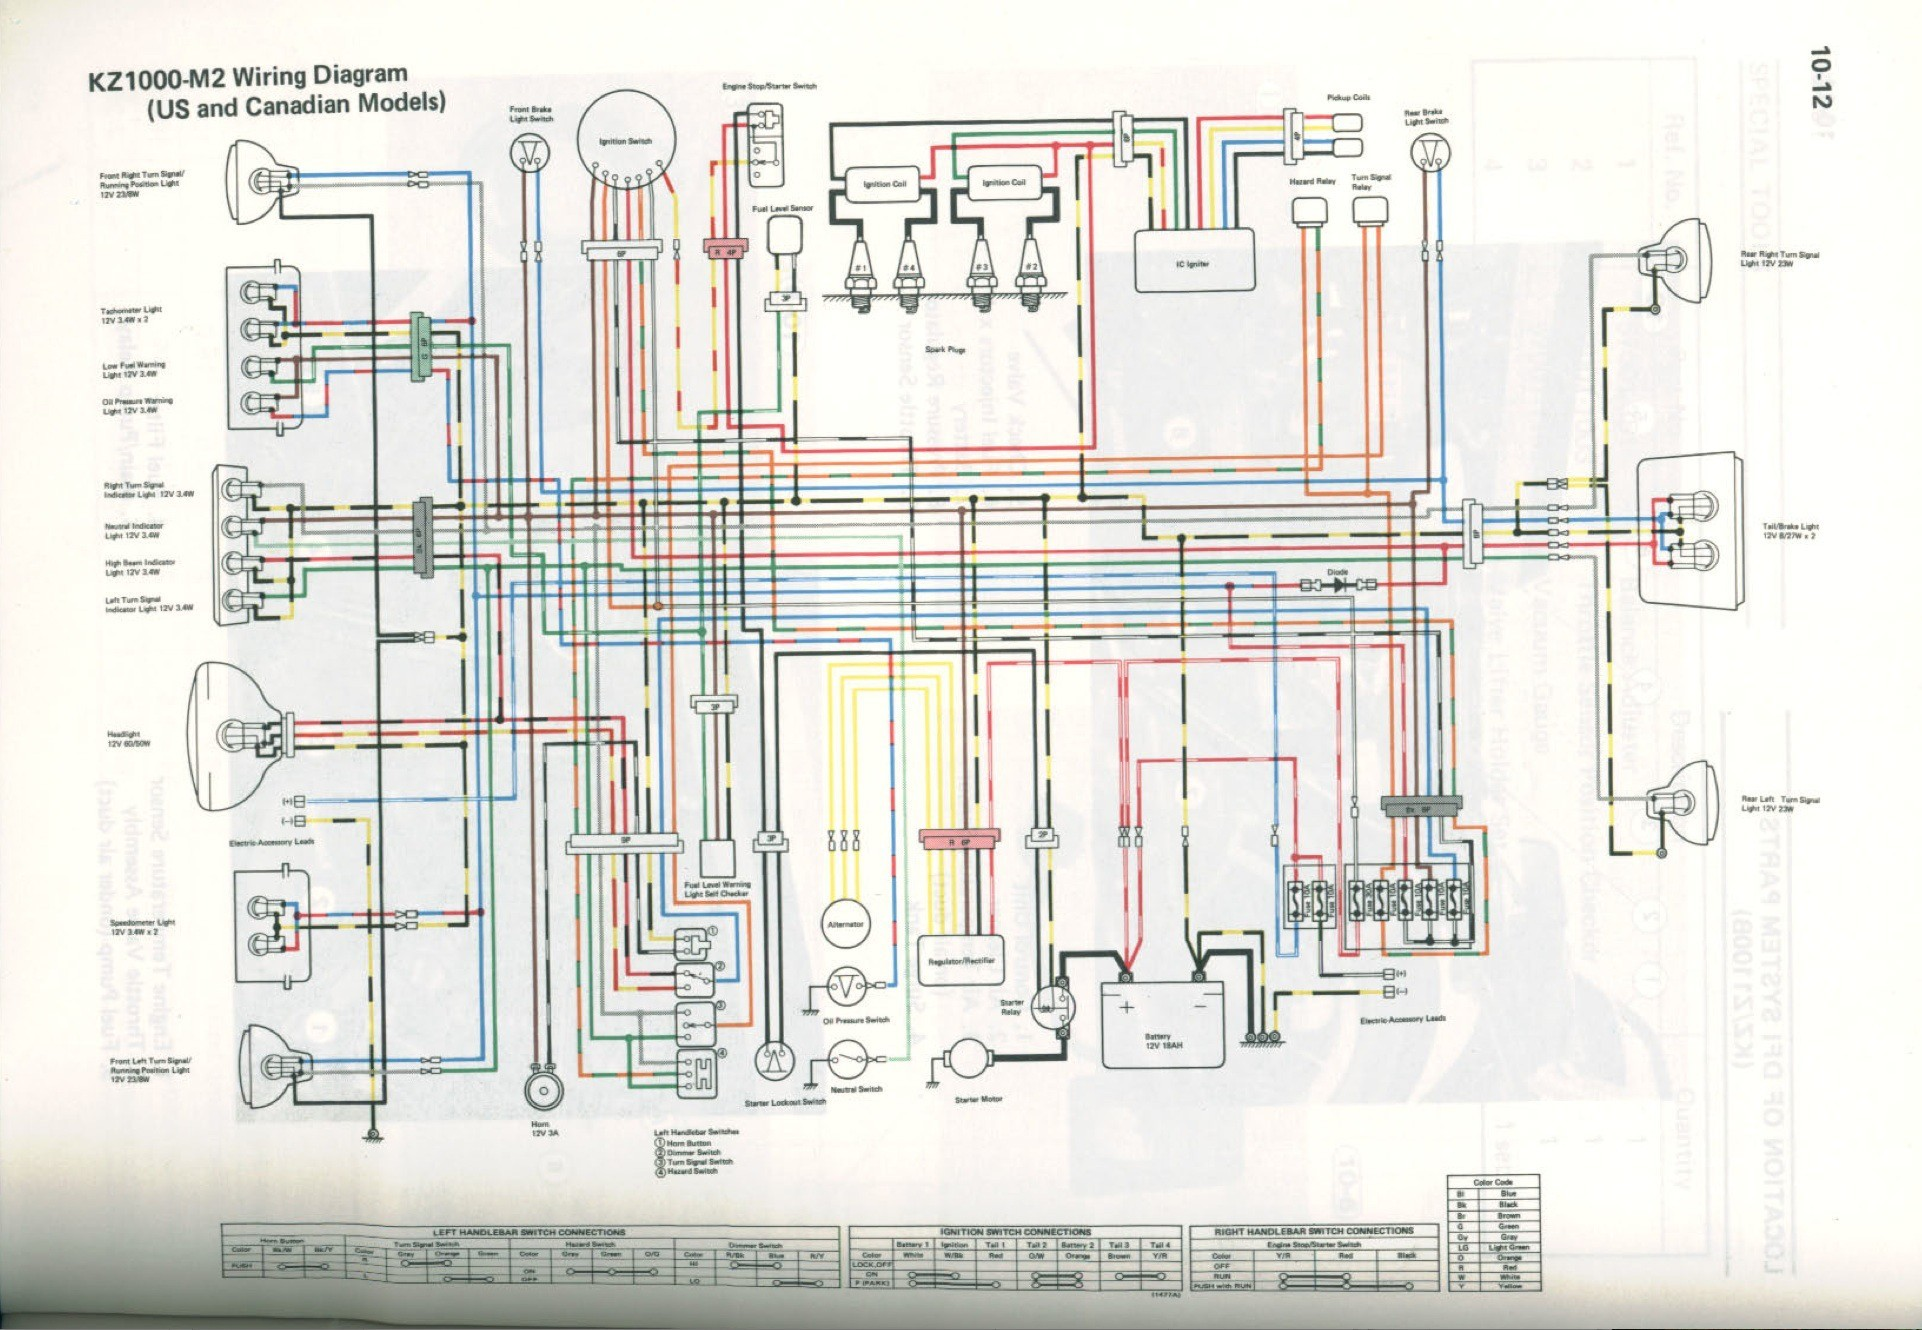 1981 Kz1000 Wiring Diagram | Wiring Diagrams on zx1000 wiring diagram, gs400 wiring diagram, motorcycle electronic ignition wiring diagram, klr650 wiring diagram, zx12 wiring diagram, klr250 wiring diagram, zx10 wiring diagram, ninja 250r wiring diagram, xs650 wiring diagram, kz1300 wiring diagram, cb750 wiring diagram, kz440 wiring diagram, ex250 wiring diagram, kl600 wiring diagram, yamaha wiring diagram, suzuki wiring diagram, kawasaki wiring diagram, cb750k wiring diagram, kz650 wiring diagram, cat 5 wiring diagram,